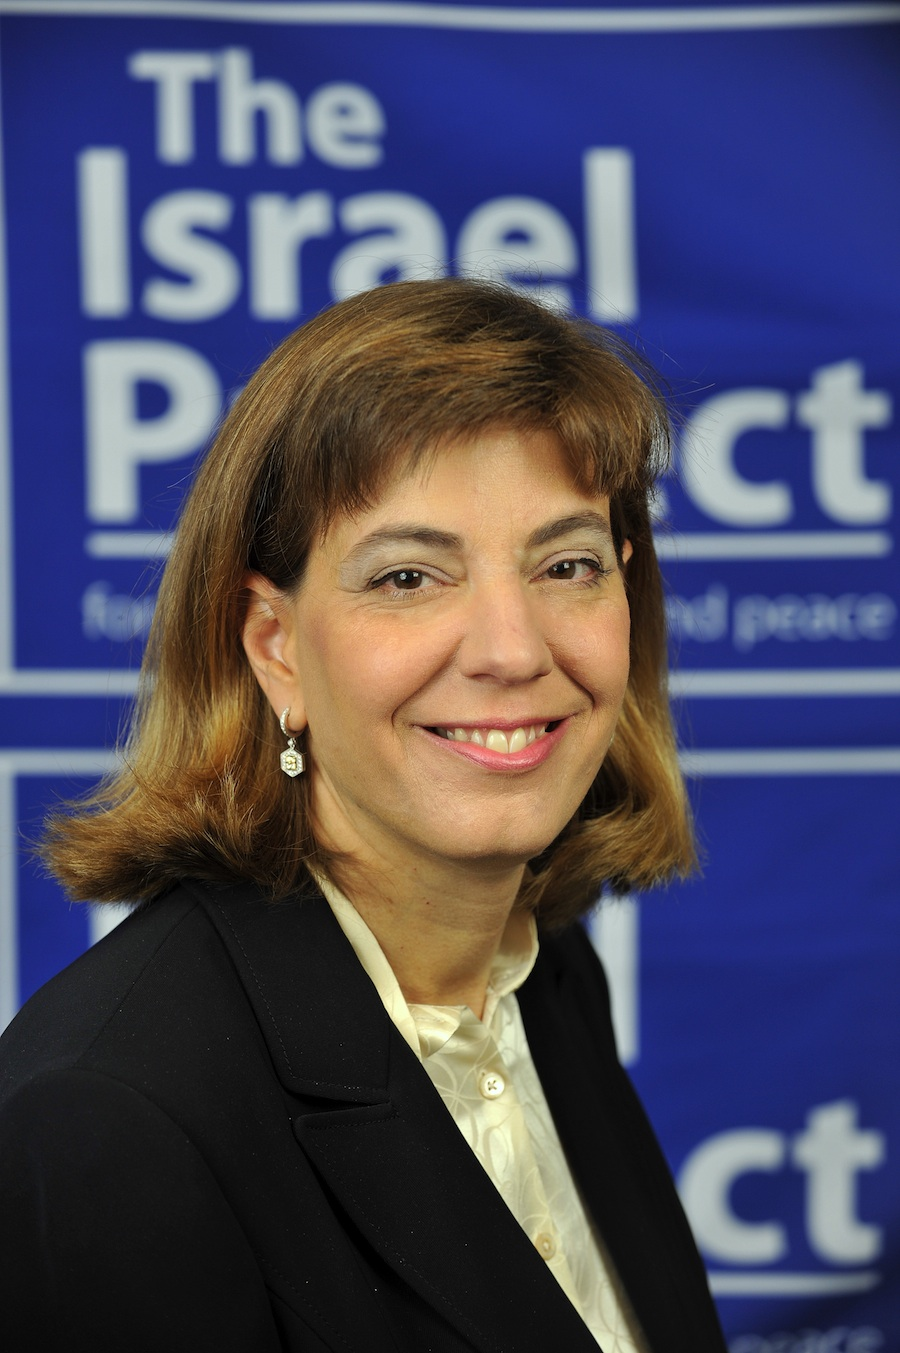 Click photo to download. Caption: Jennifer Laszlo Mizrahi. Credit: The Israel Project.